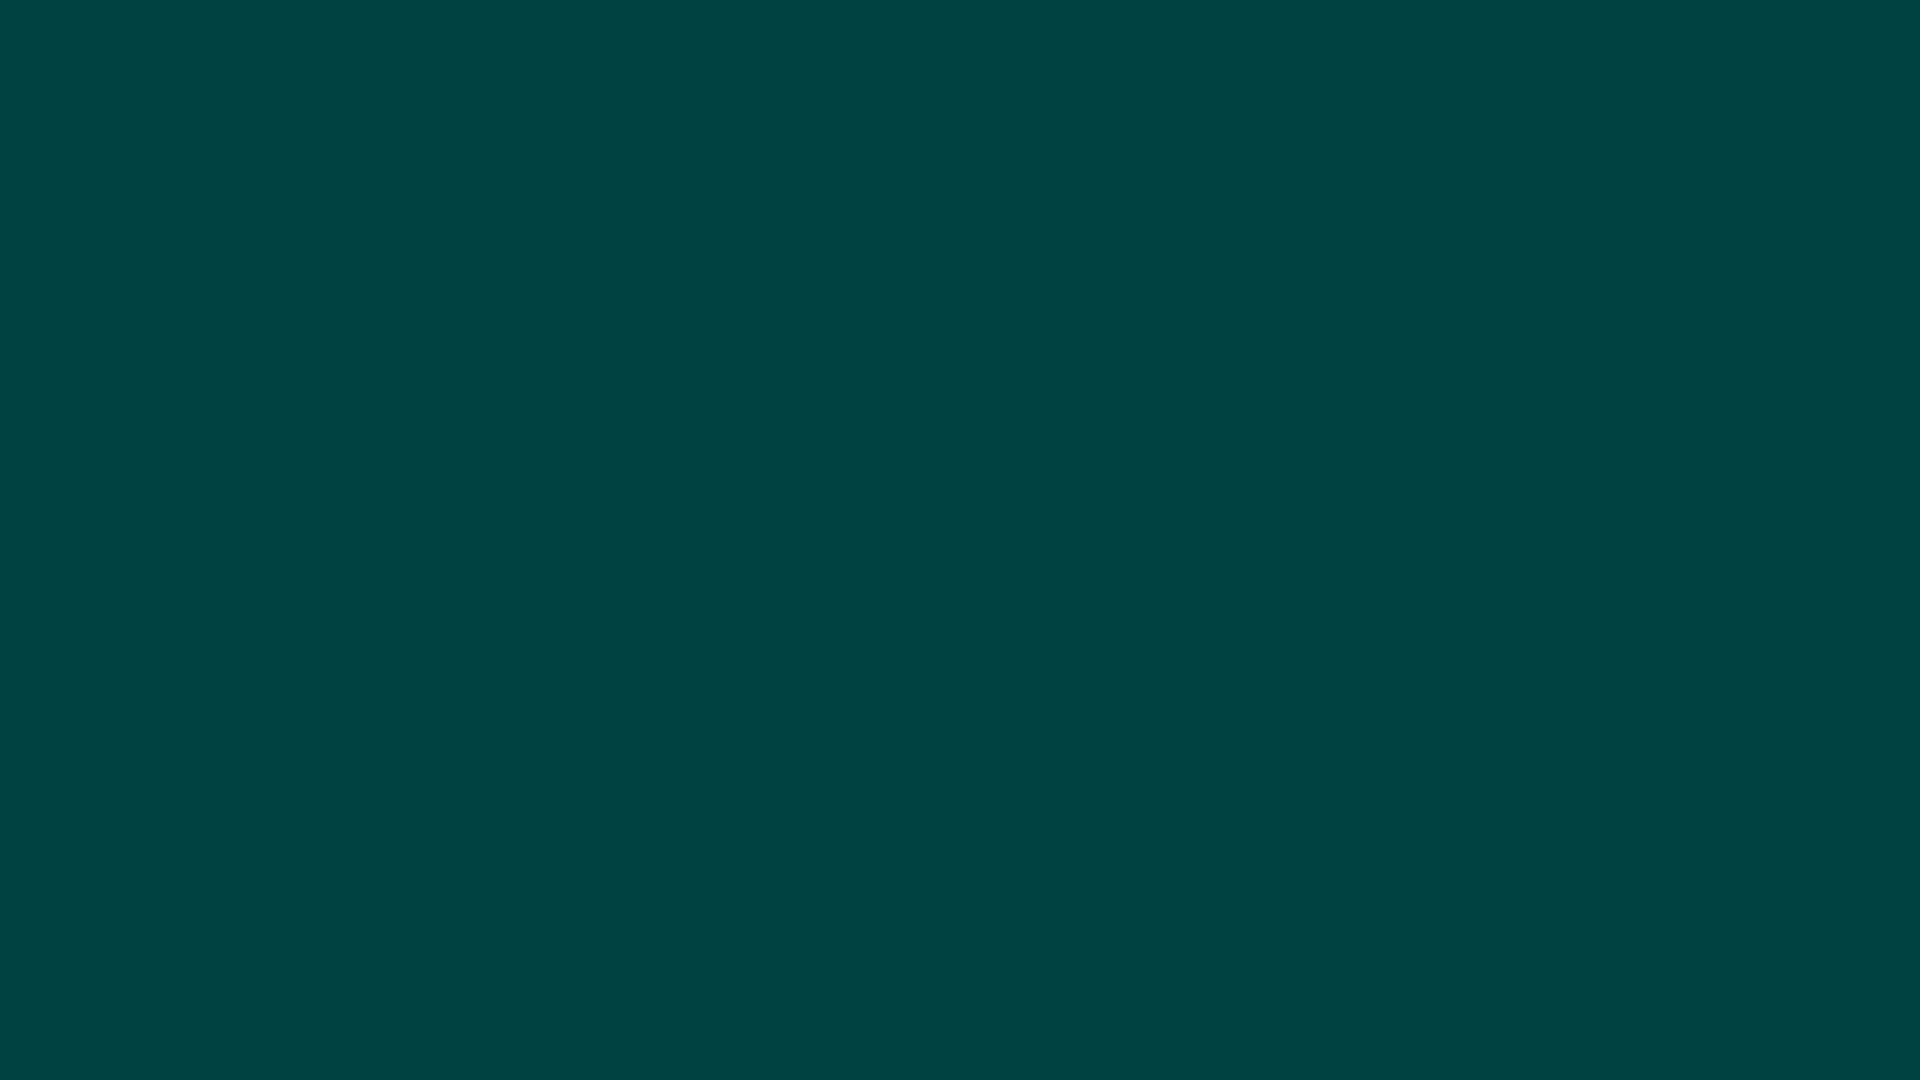 solid-color-hd-wallpaper.jpg